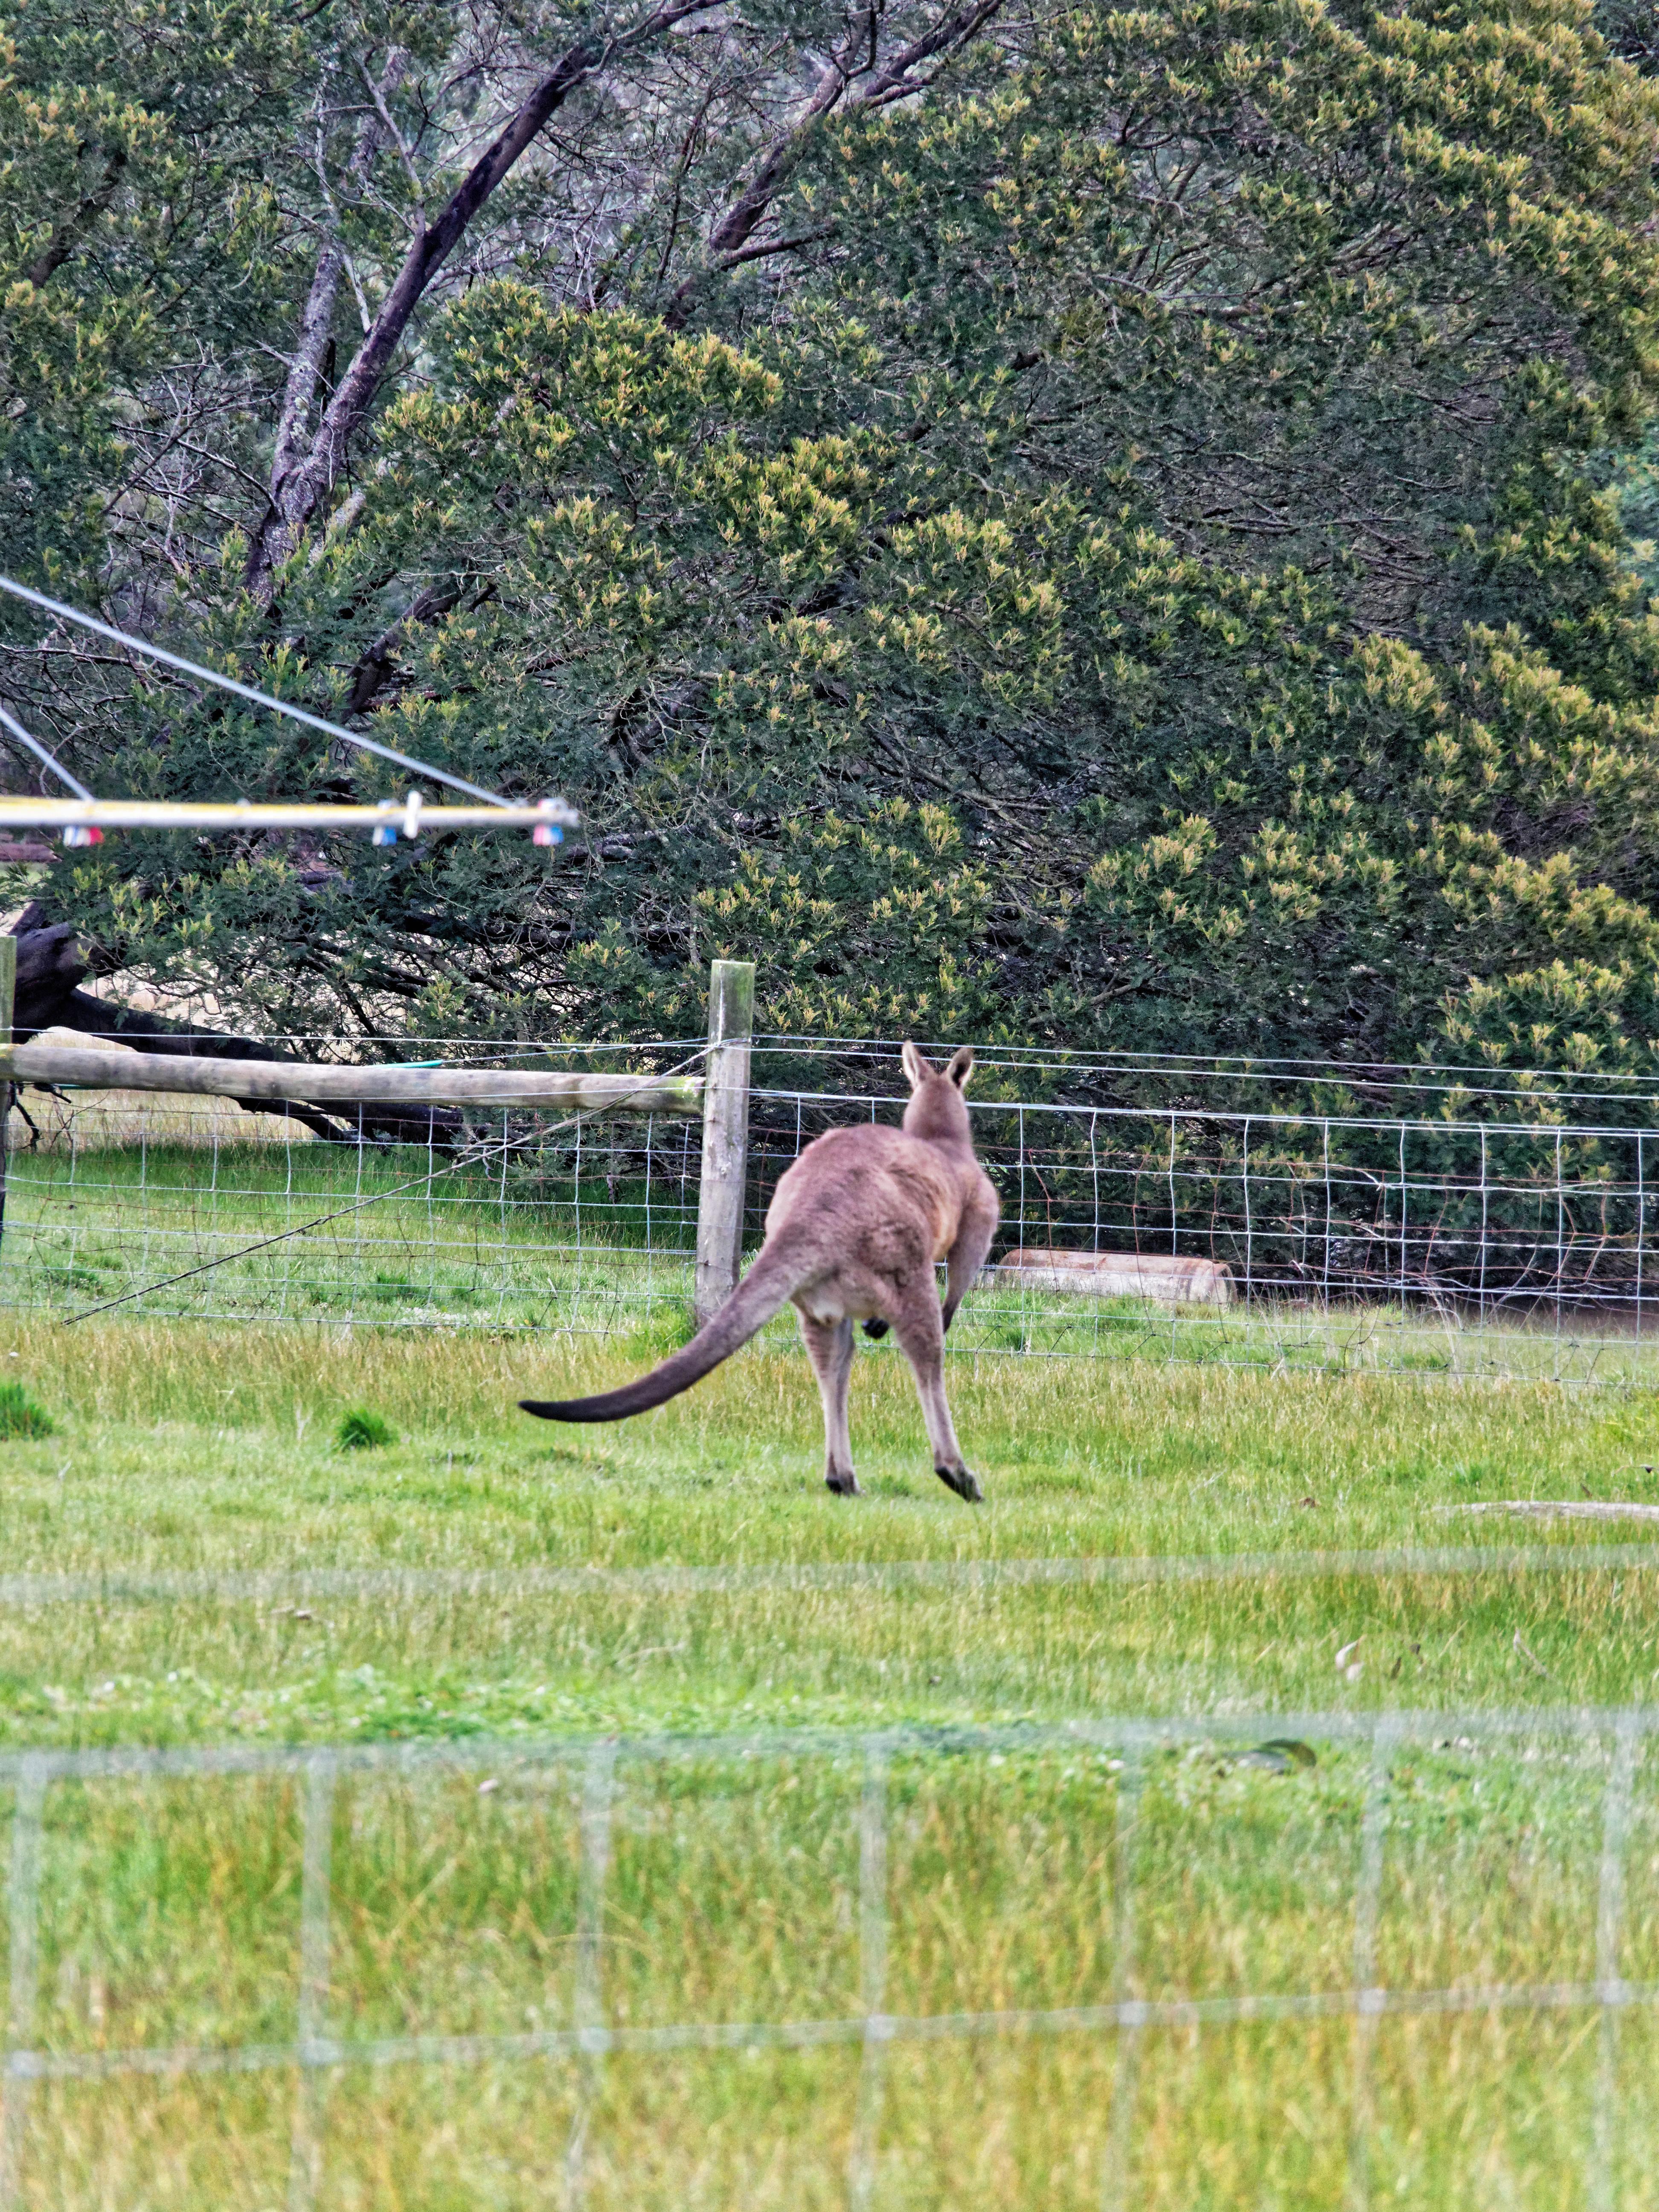 Kangaroo-8.jpeg